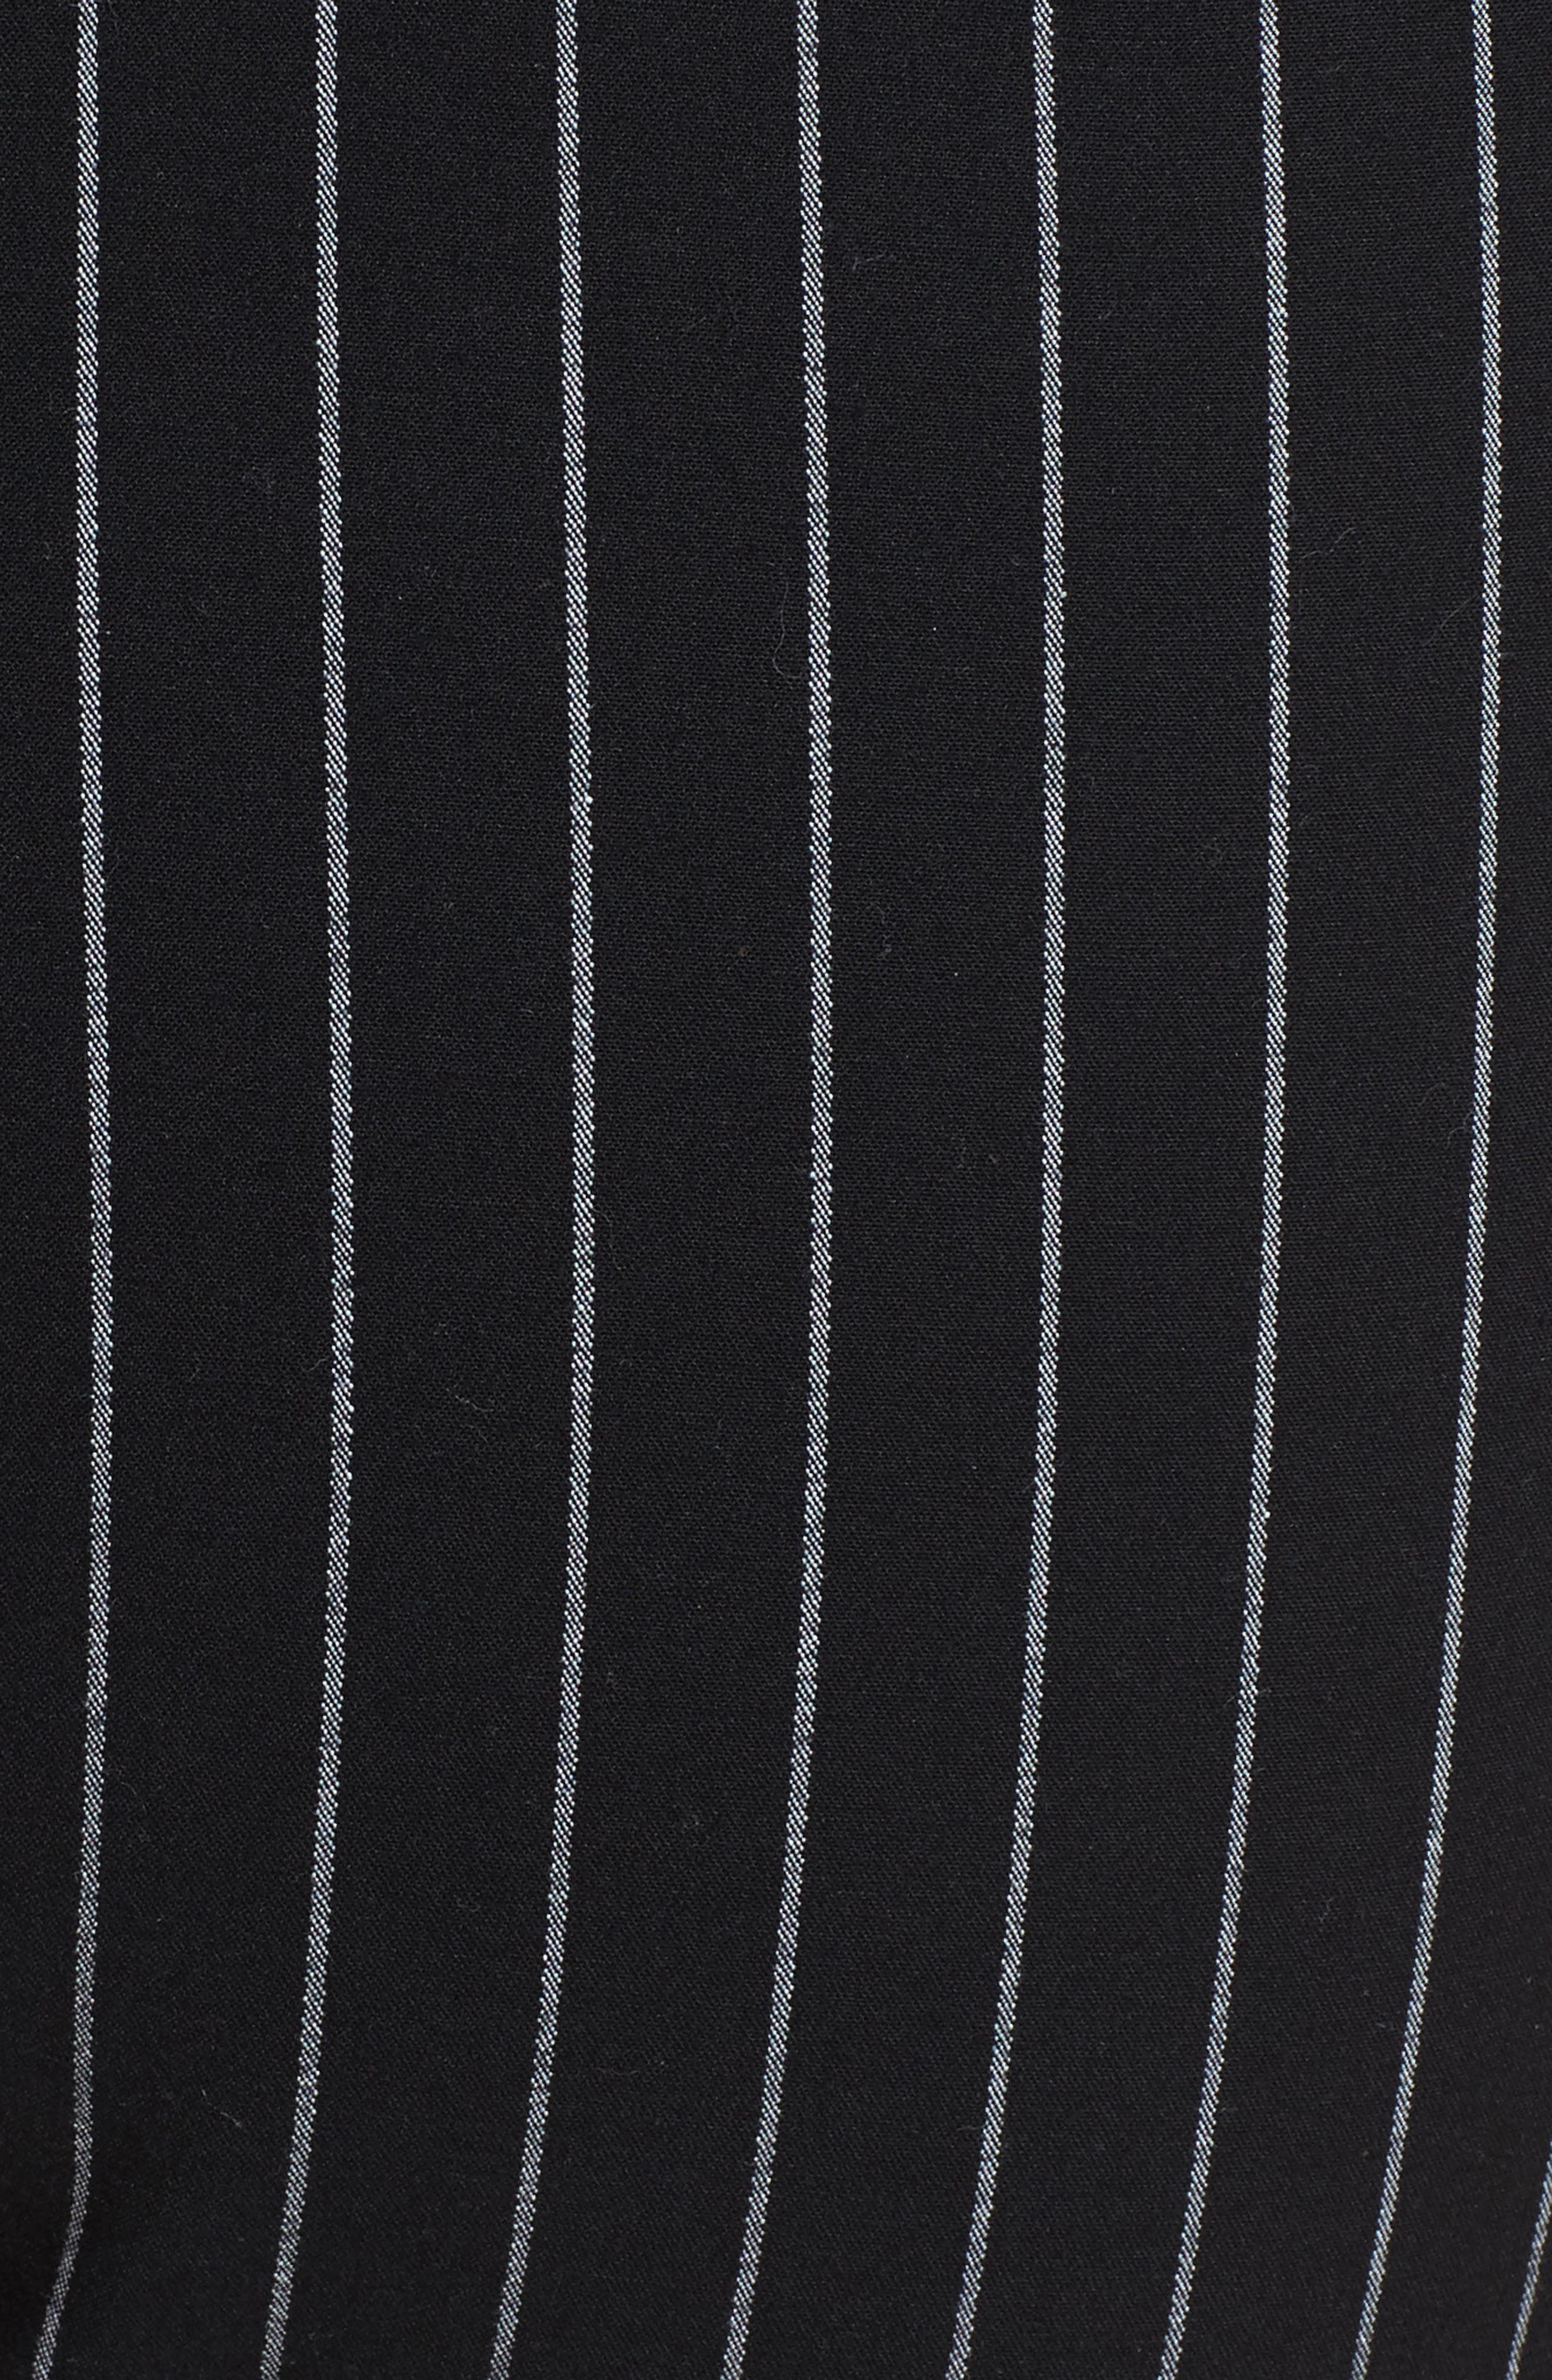 Simone Pinstripe Pants,                             Alternate thumbnail 5, color,                             Black/ White